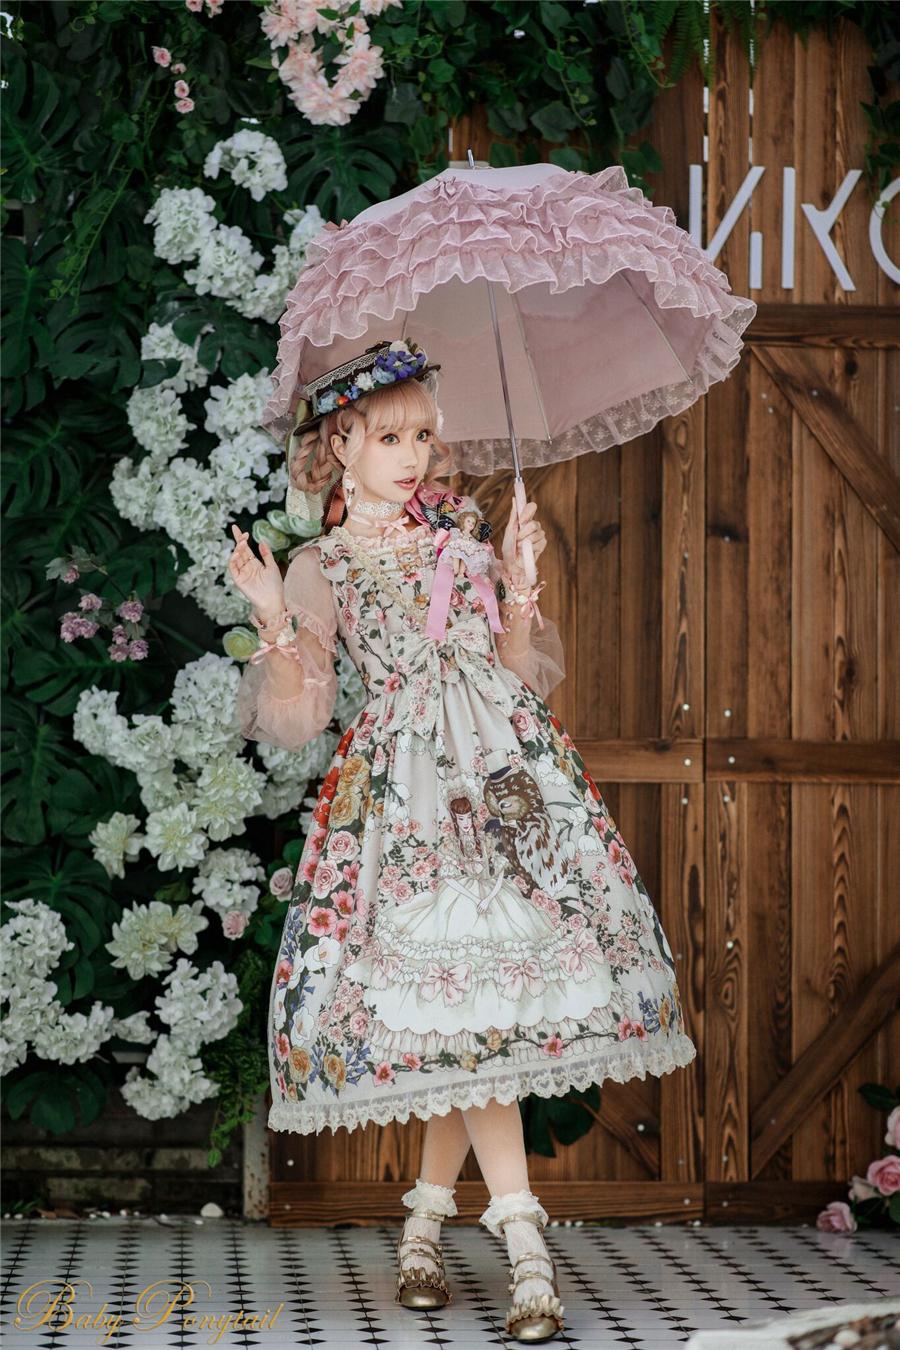 Polly's Garden of Dreams_Model Photo_Ivory JSK_Kaka_05.jpg